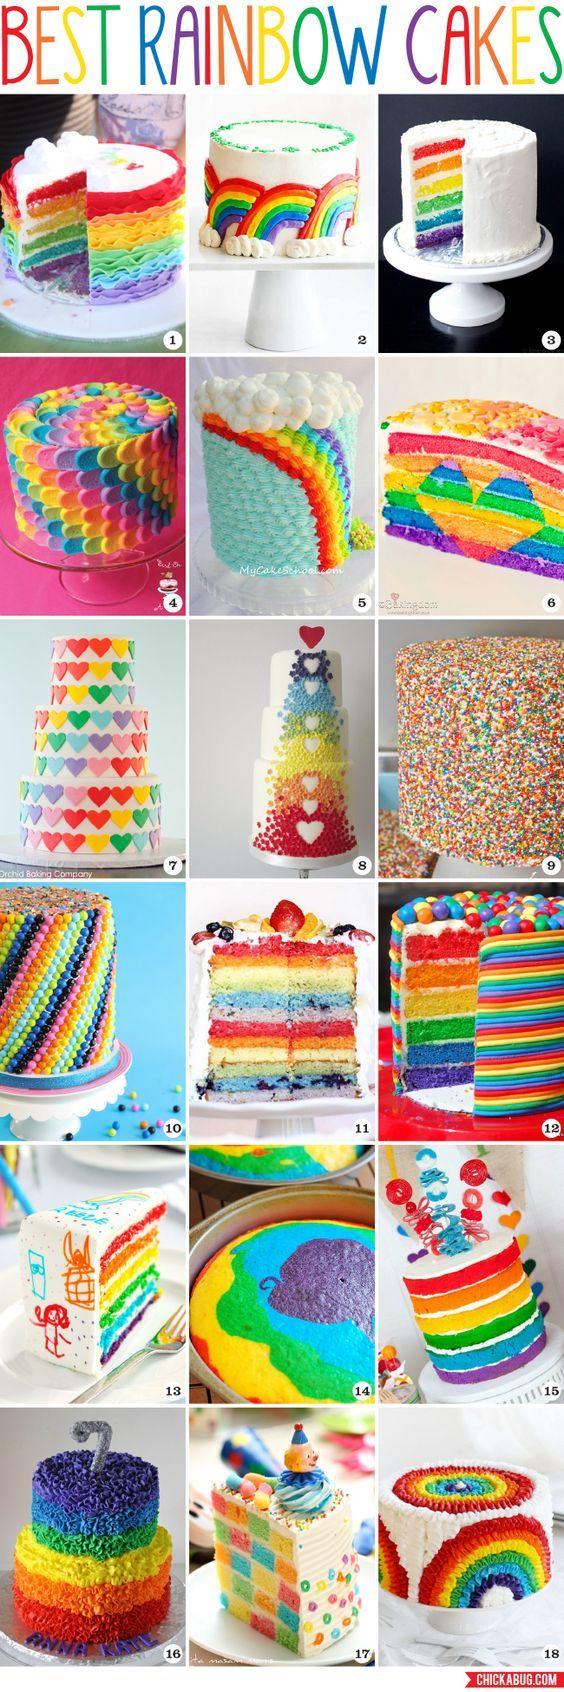 The BEST rainbow cakes! Recipes & decorating ideas